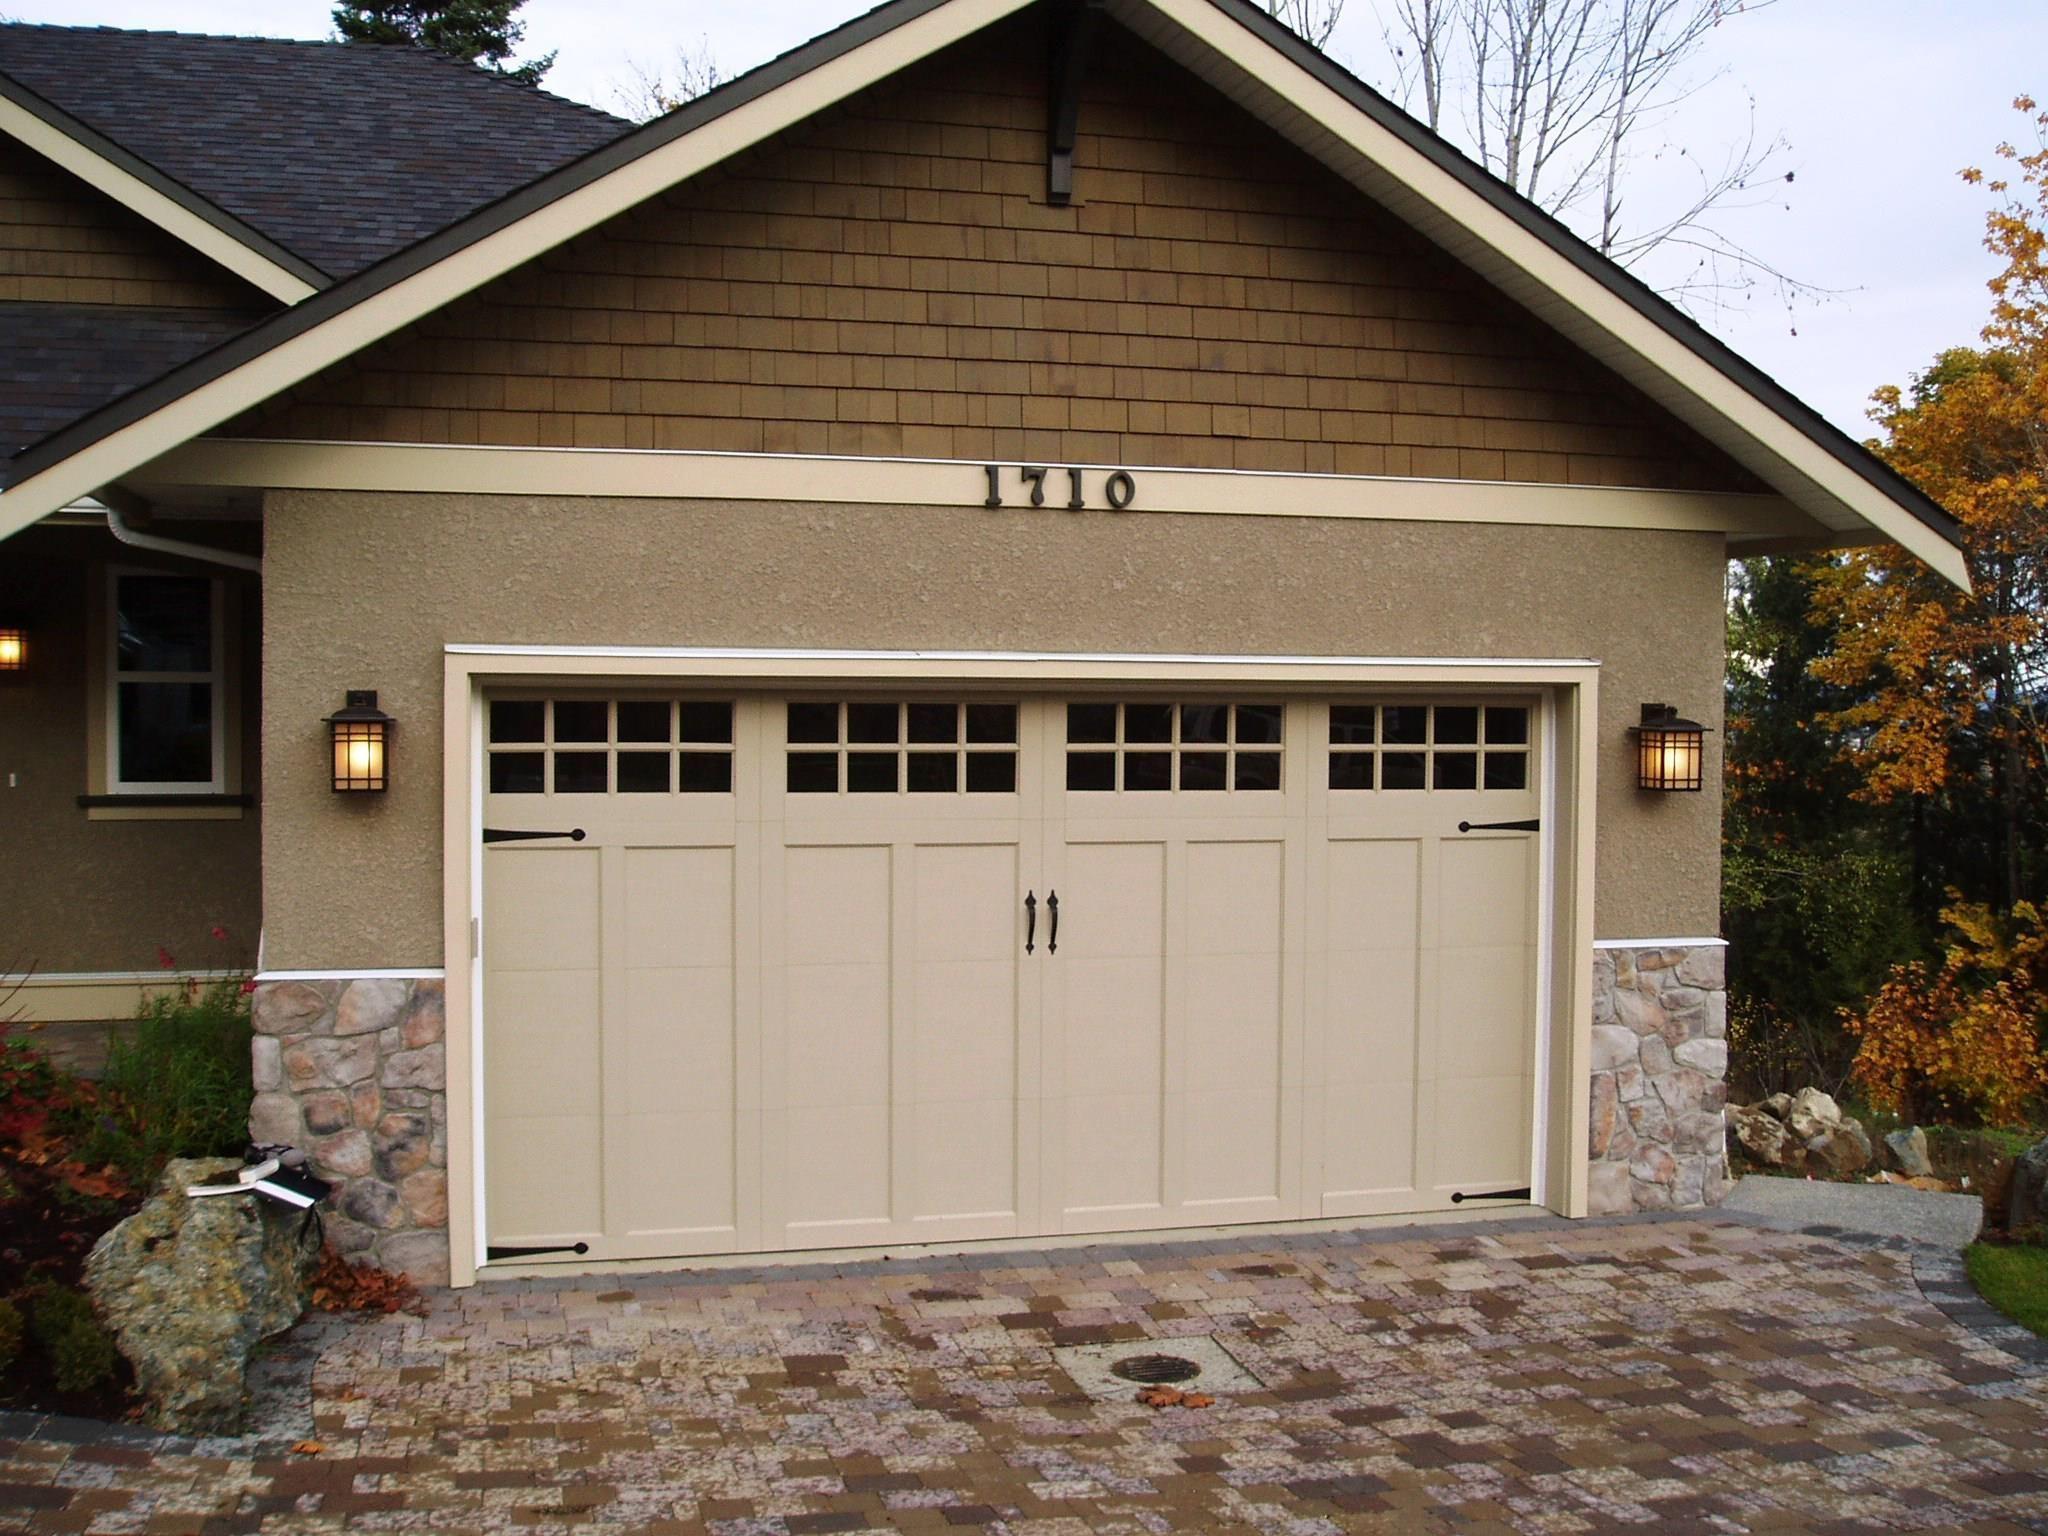 opener doors craftsman best art ideas liftmaster style on x designs proportions weather barn garage for styles pinterest door stripping intended